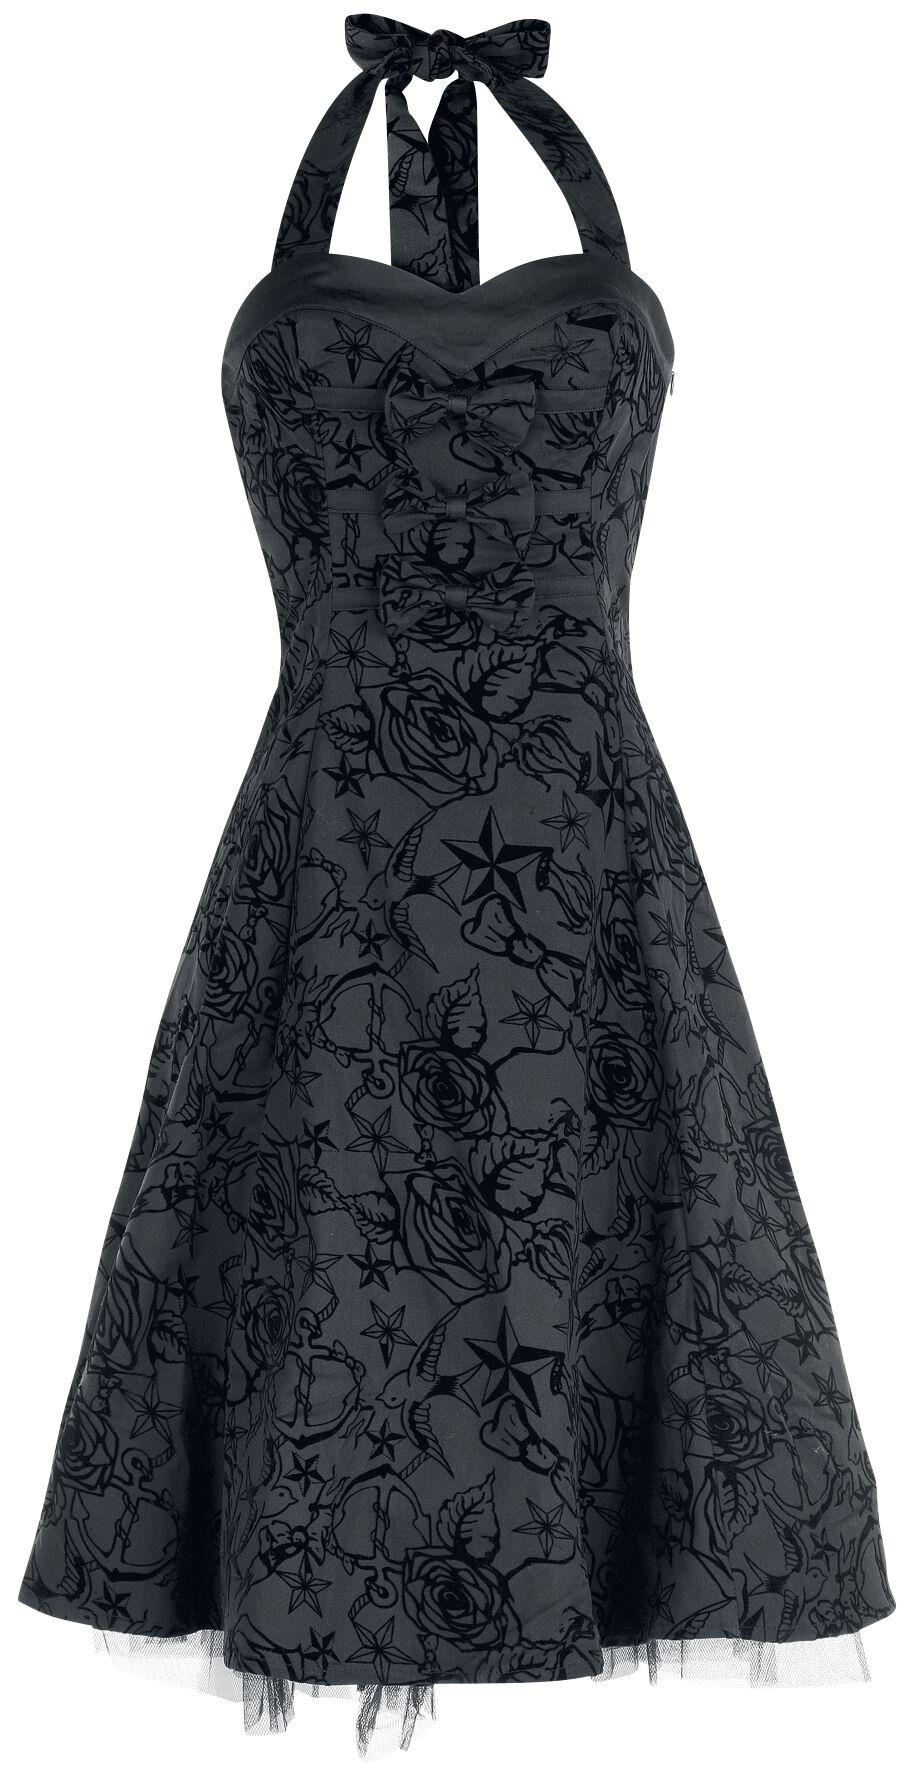 H&R London Longue tattoo Dress Sukienka czarny